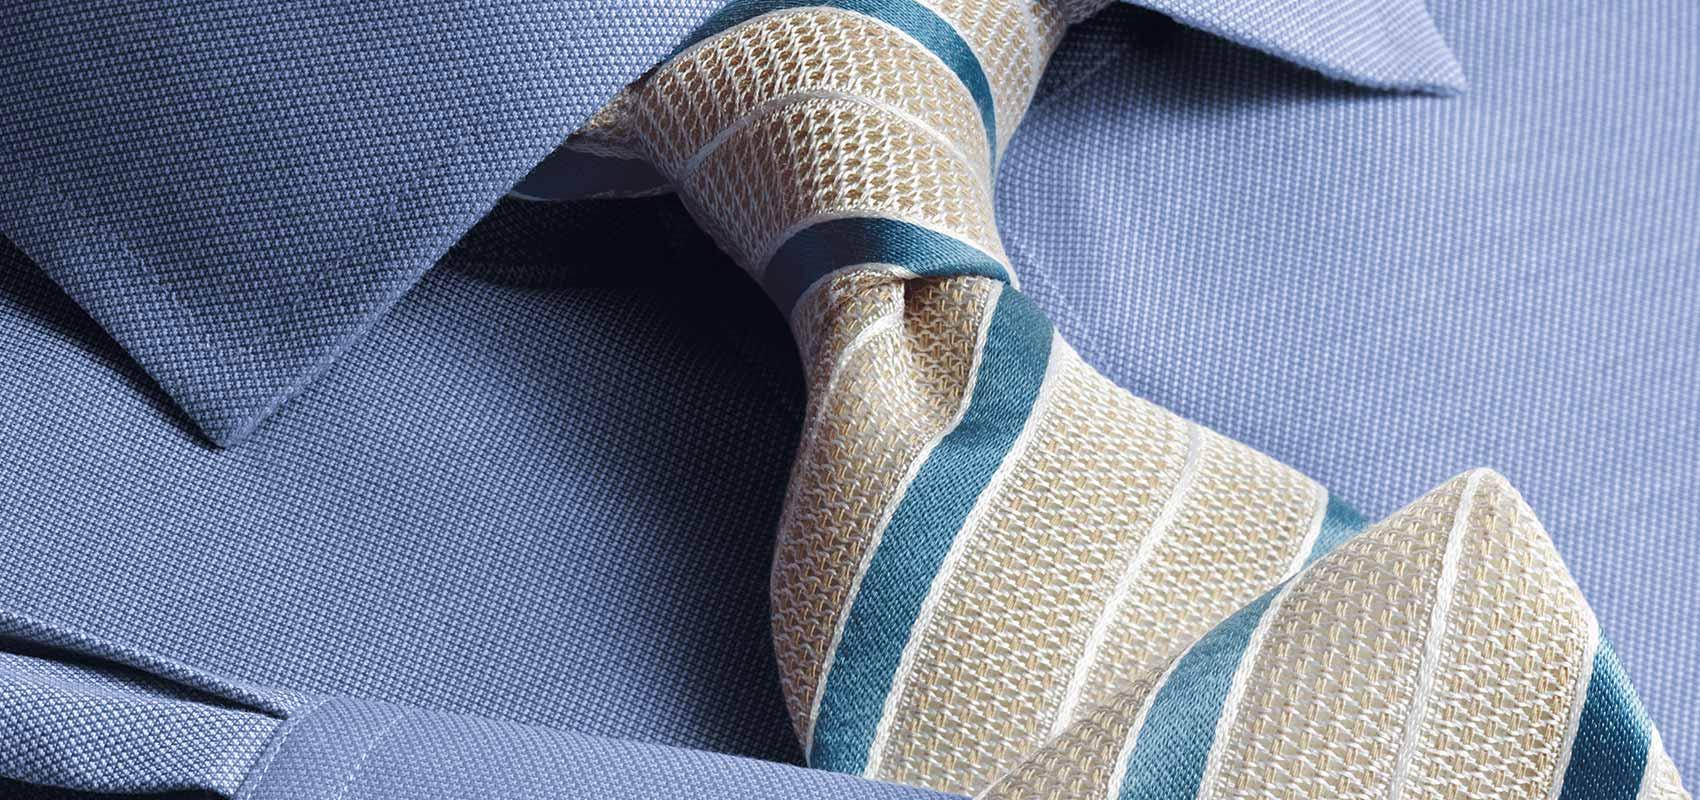 Charles Tyrwhitt krawatten